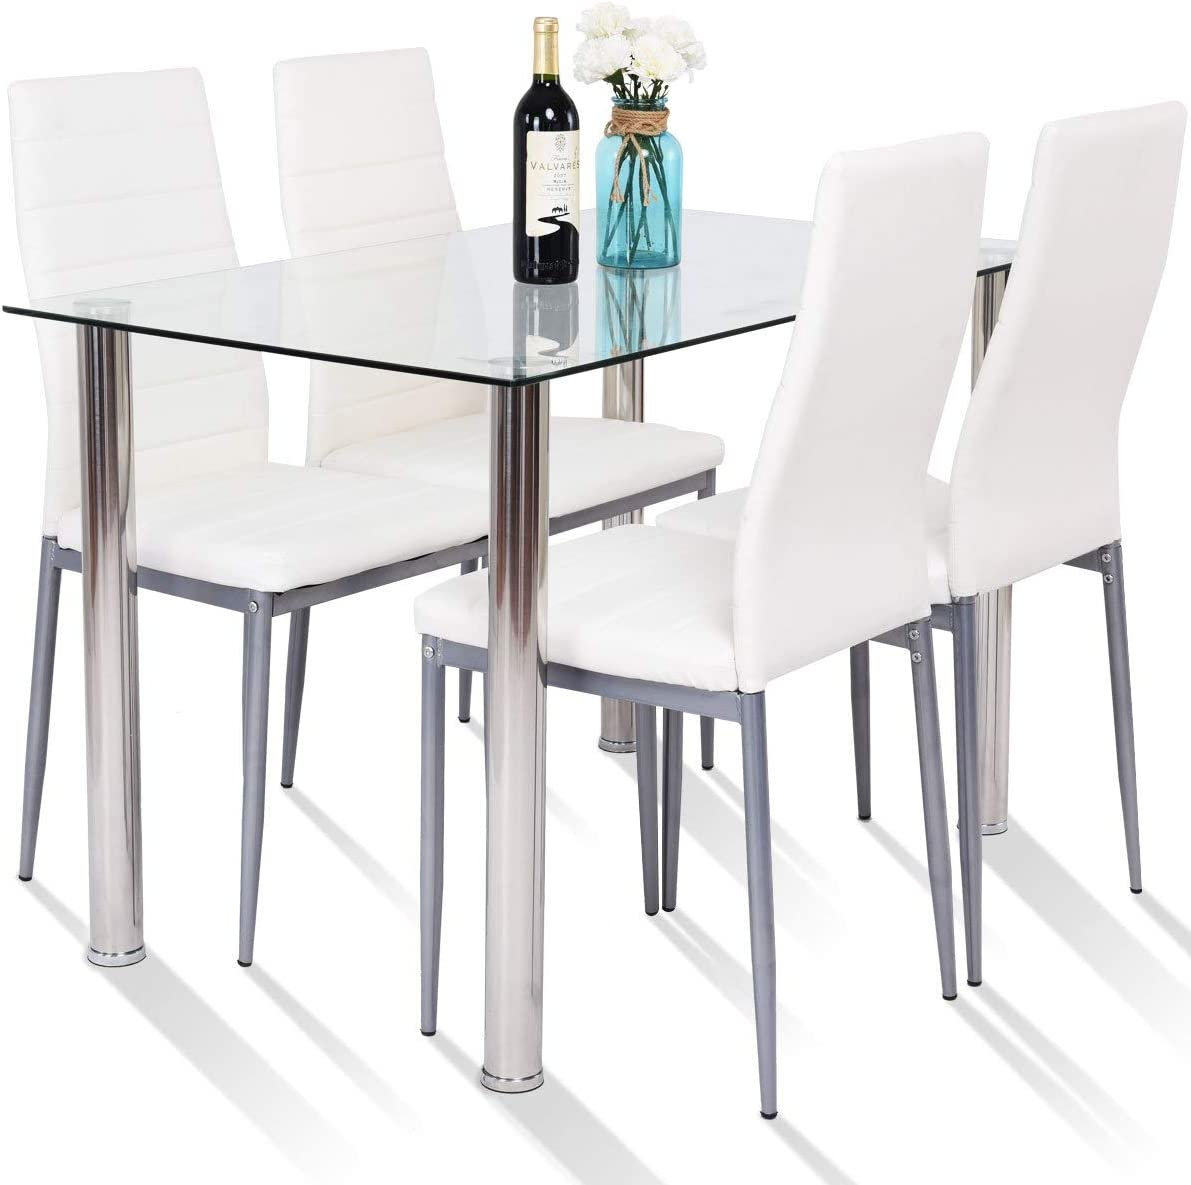 Amazon.com - Tangkula 5 PCS Dining Table Set Modern Tempered ...